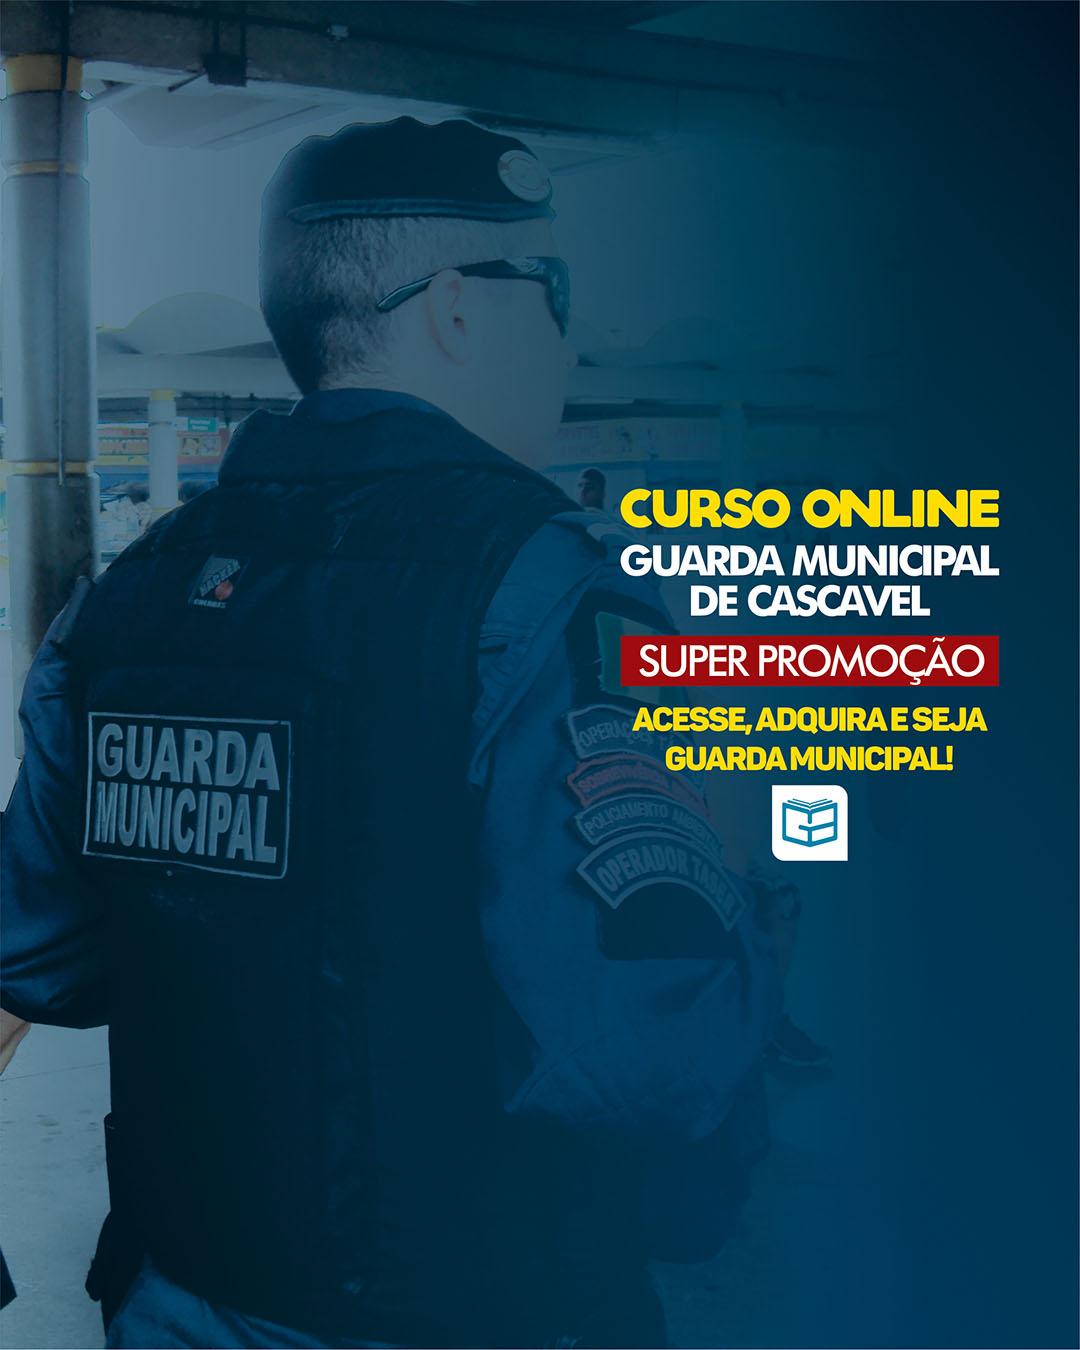 CURSO COMPLETO PARA GUARDA MUNICIPAL DE CASCAVEL